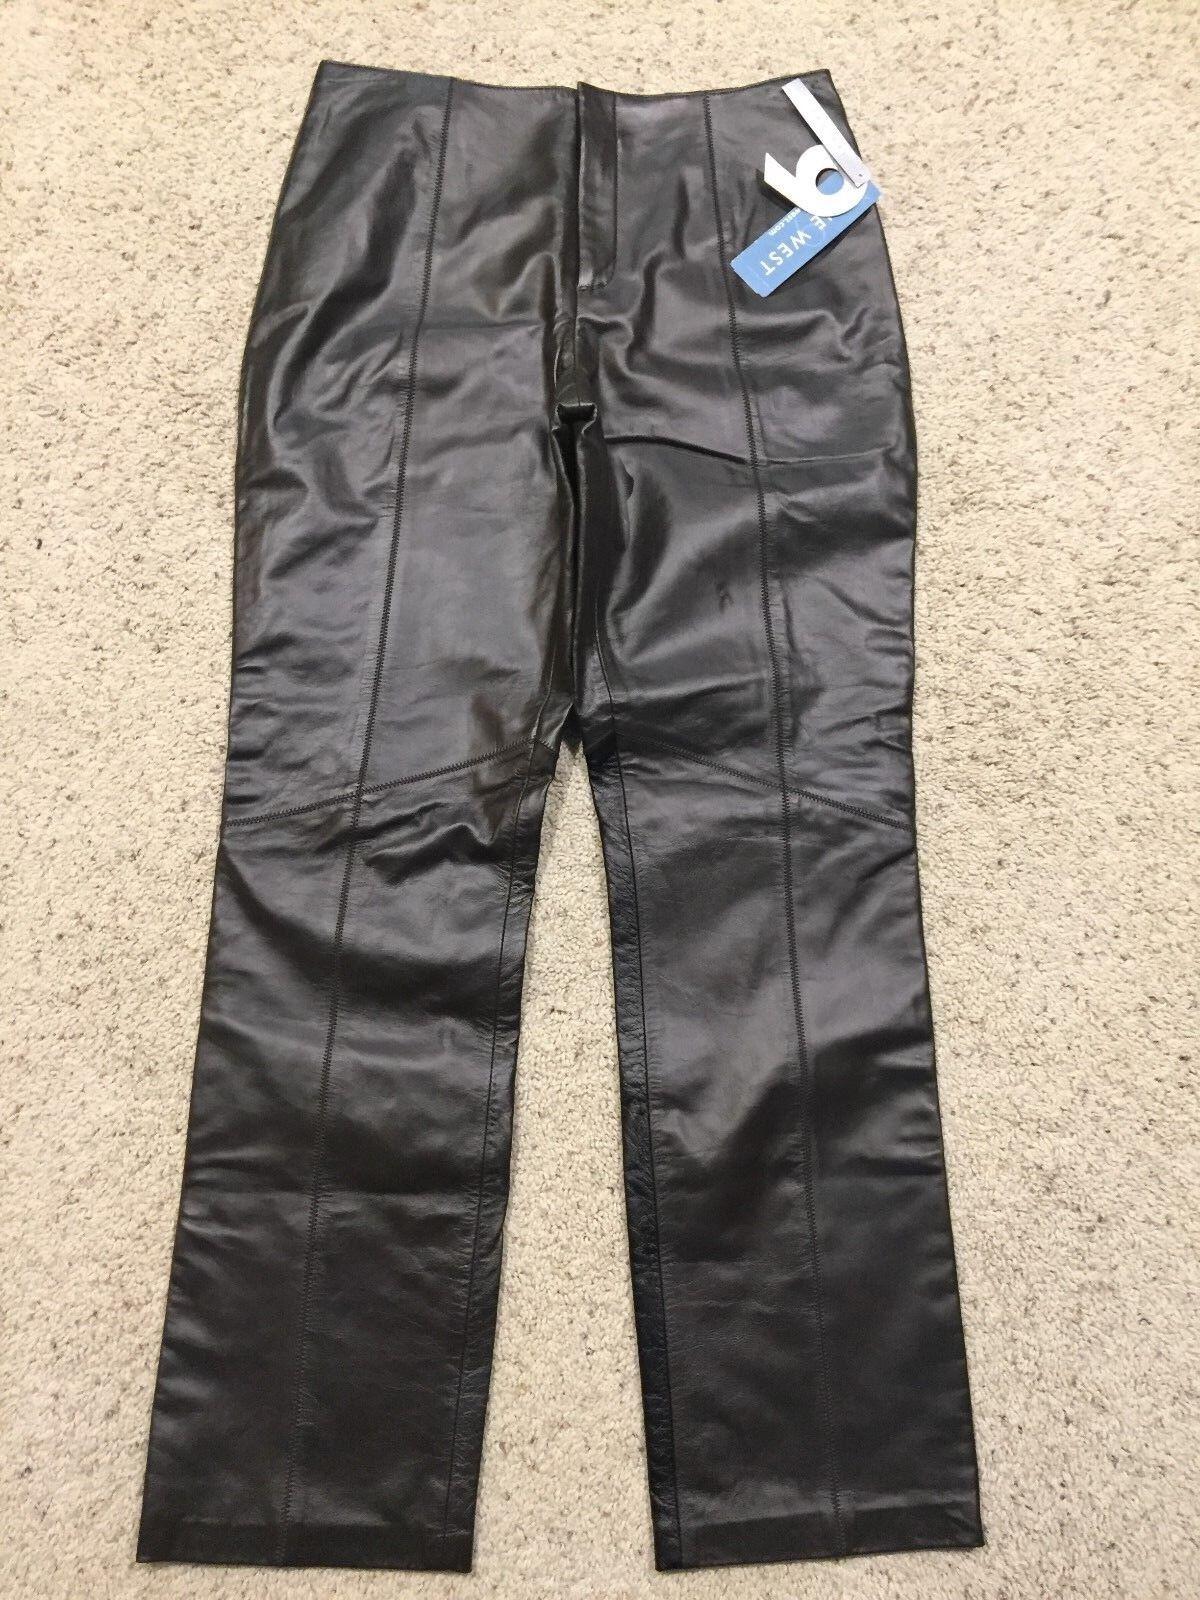 NWT  159  NINE WEST  100% LEATHER Dark Brown PANTS size 6  NEW  K7